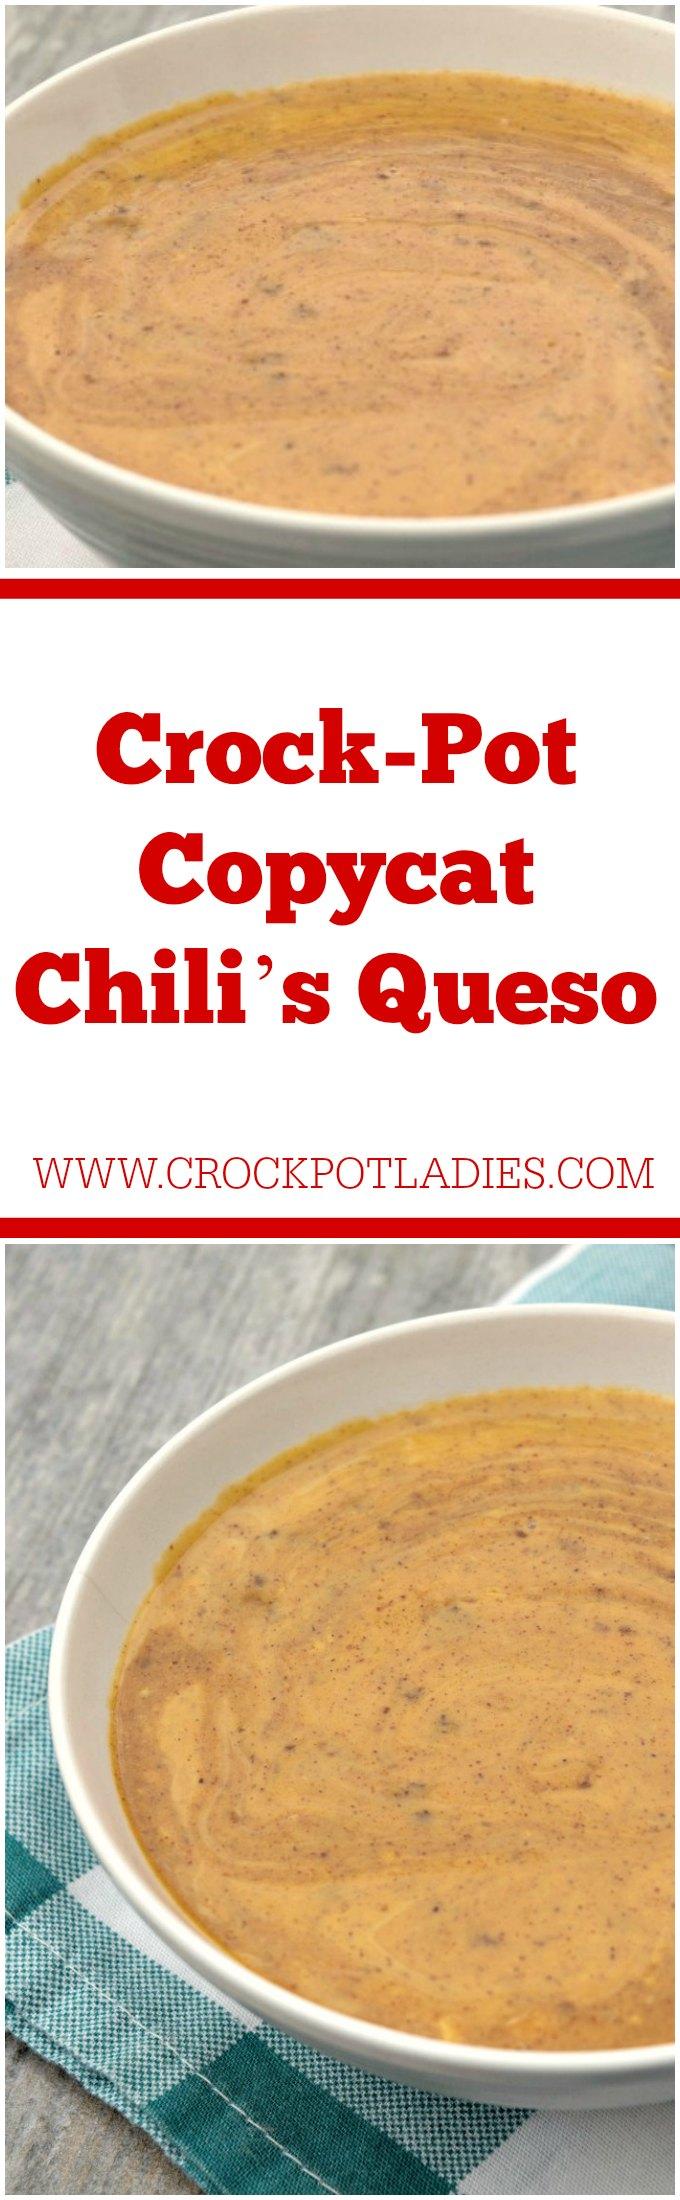 Crock-Pot Copycat Chili's Queso